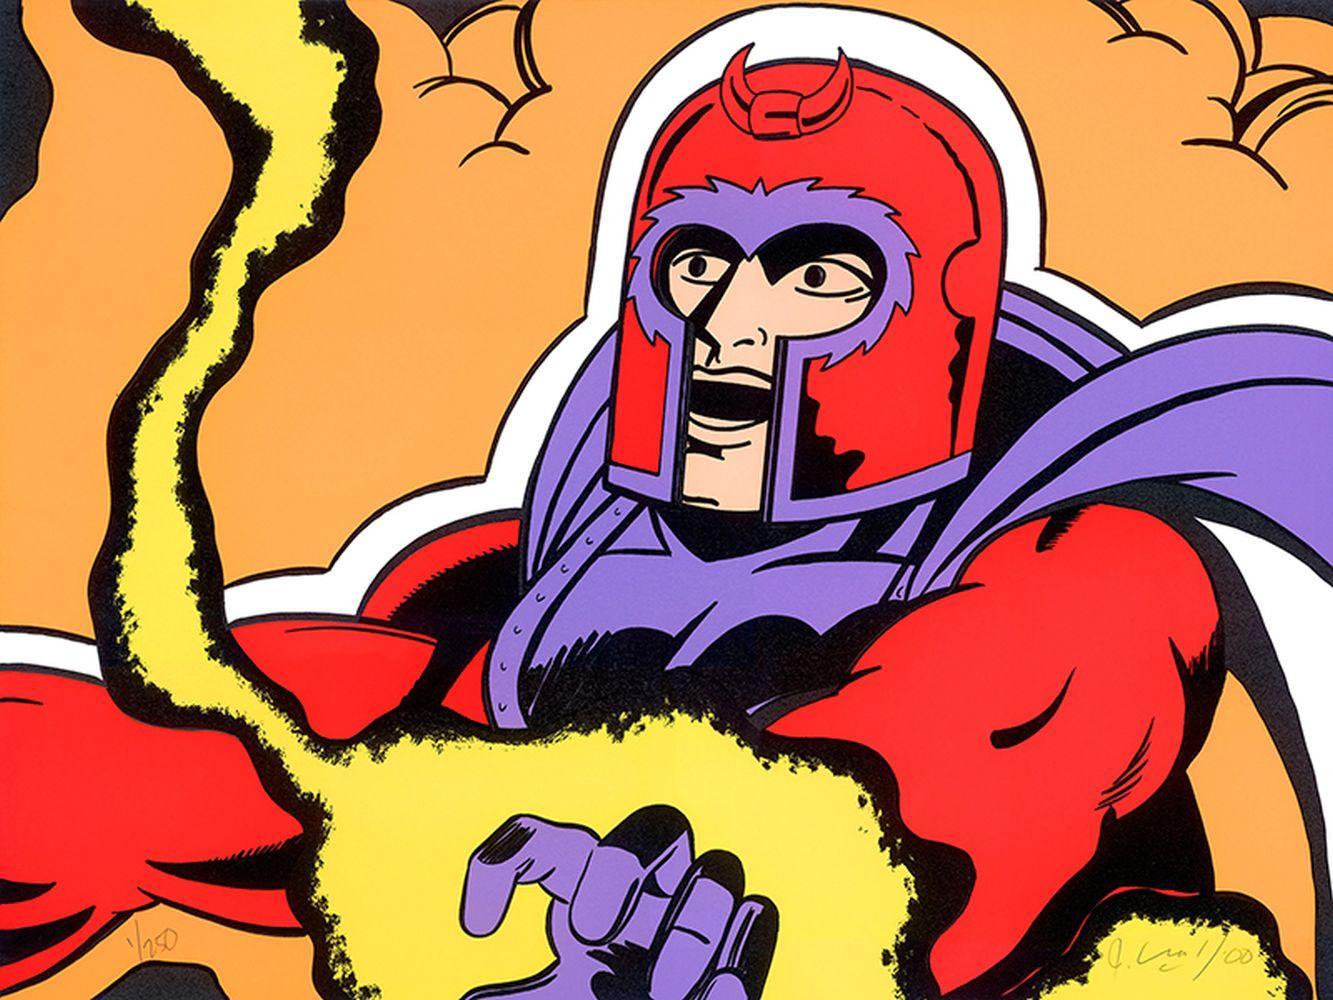 John Matos (Crash) - X-men Magneto, 2000